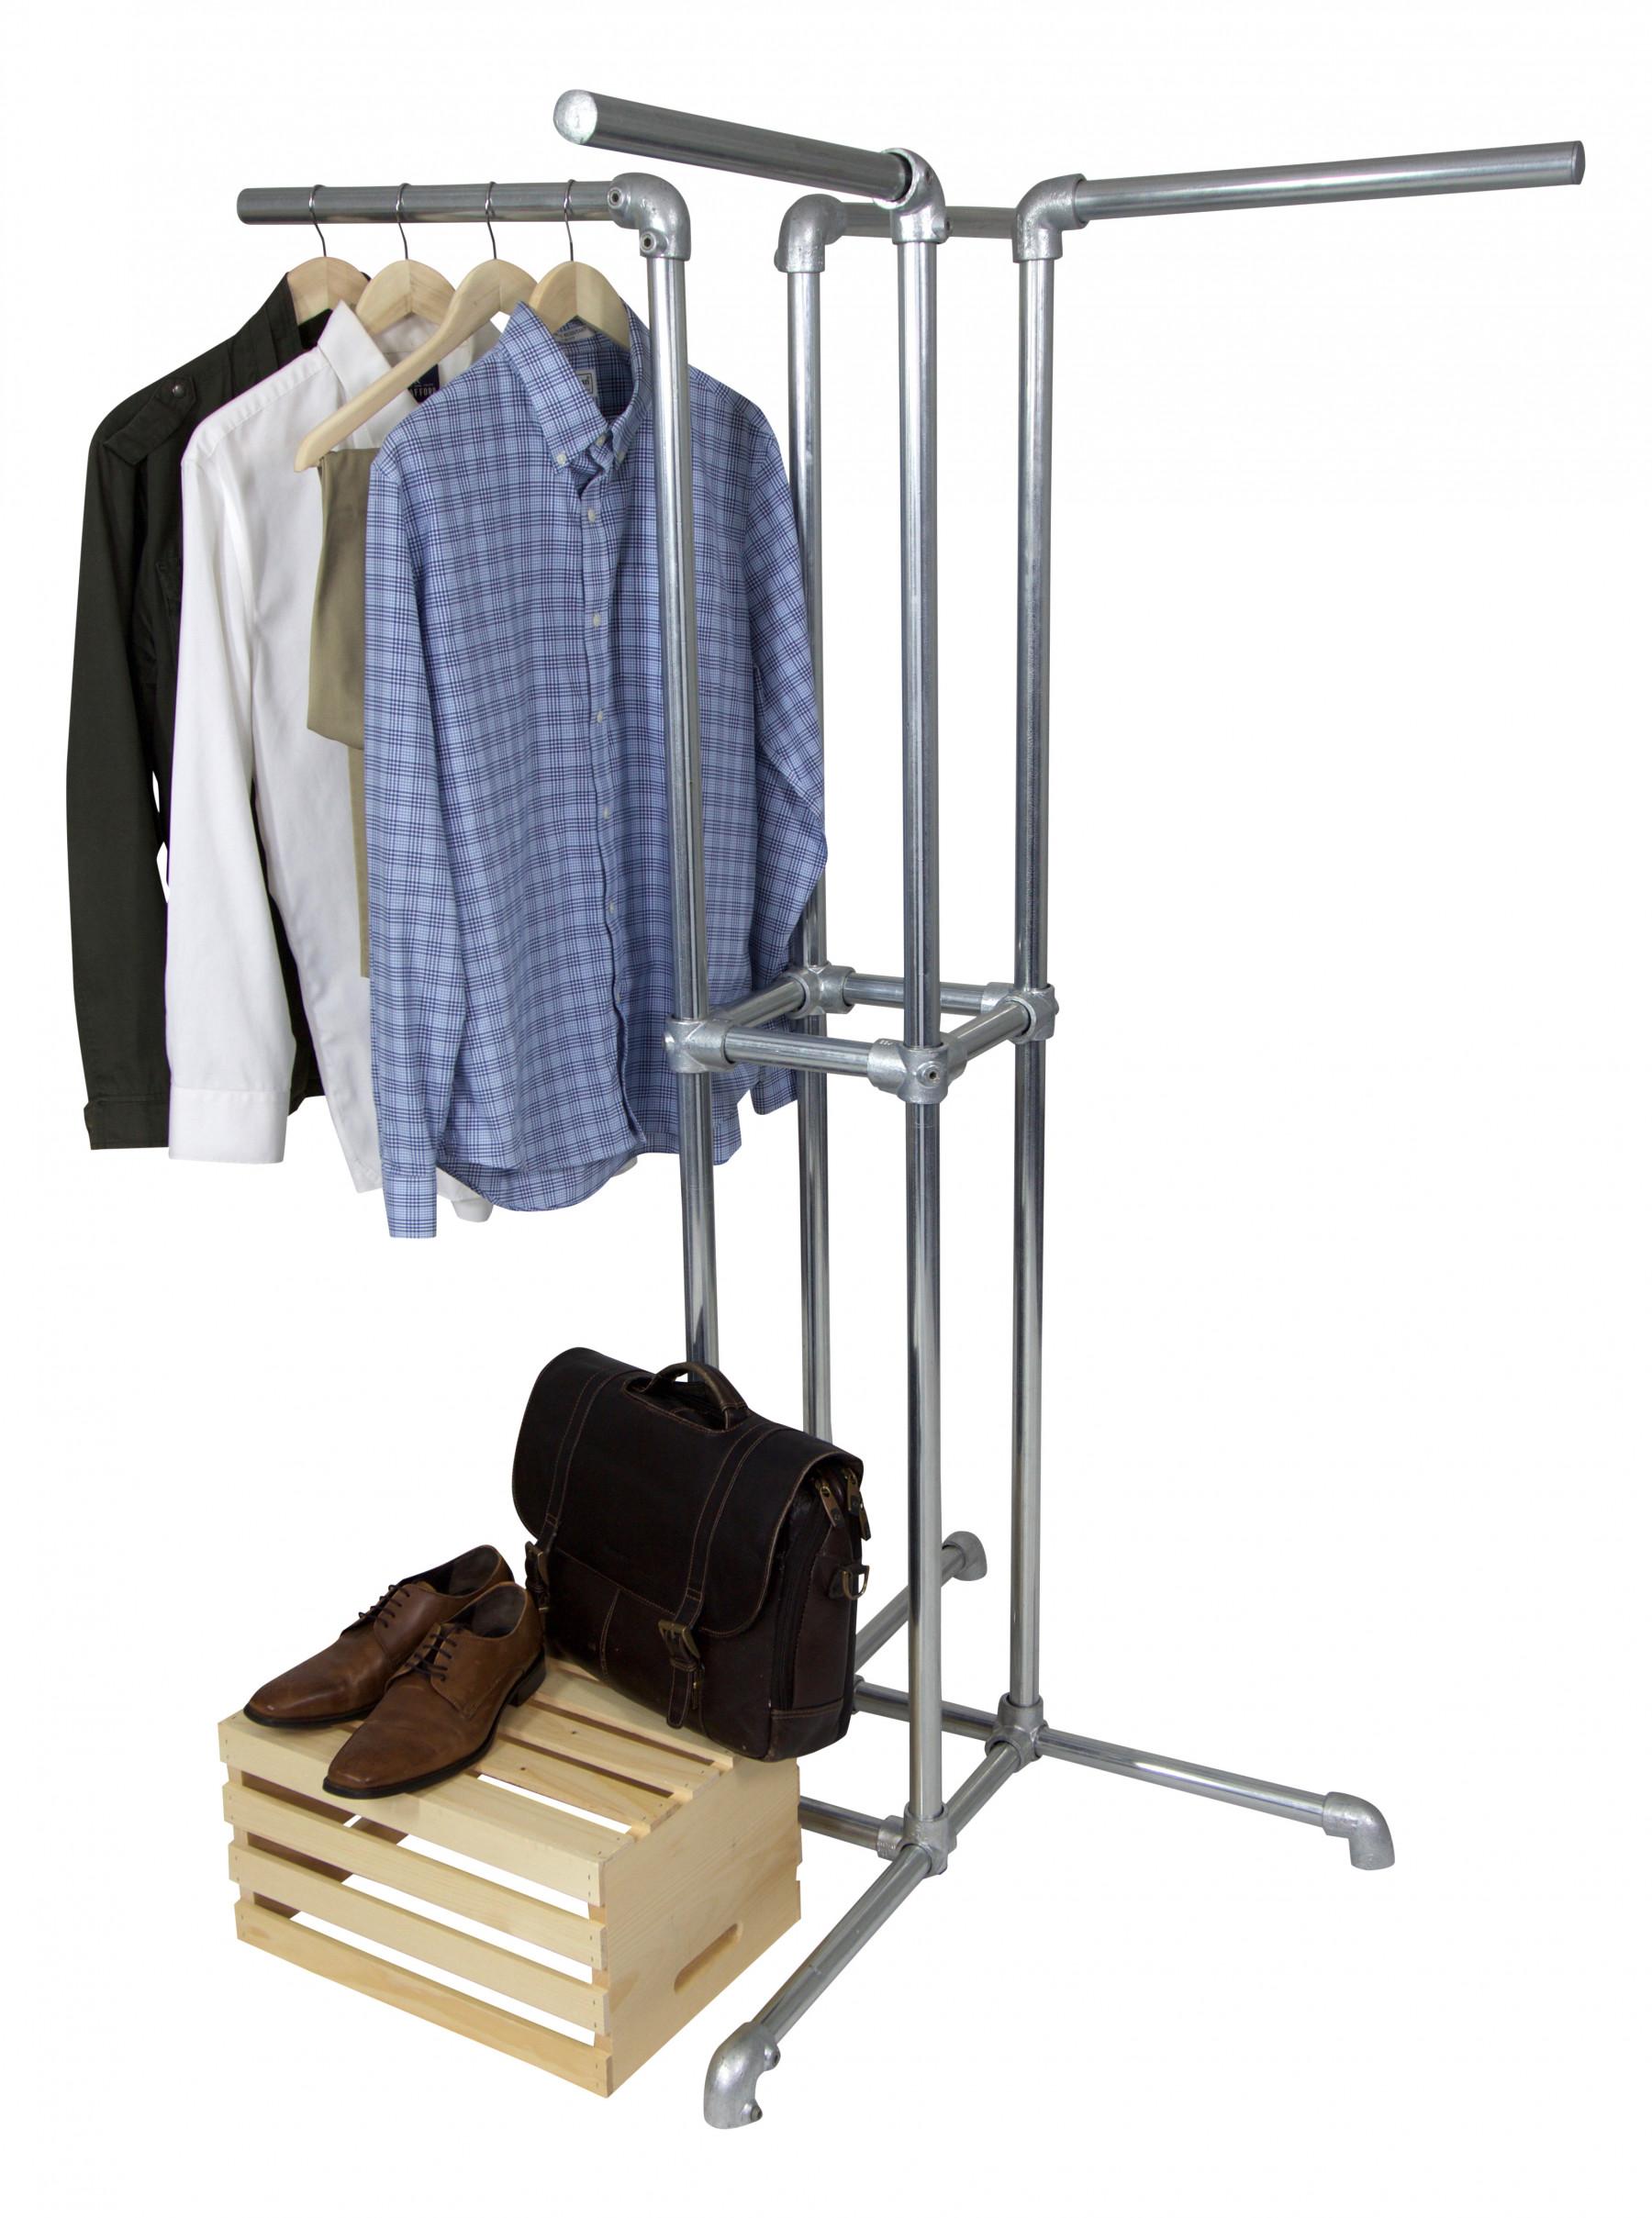 4 Way Pipe Clothing Rack Simplified Building